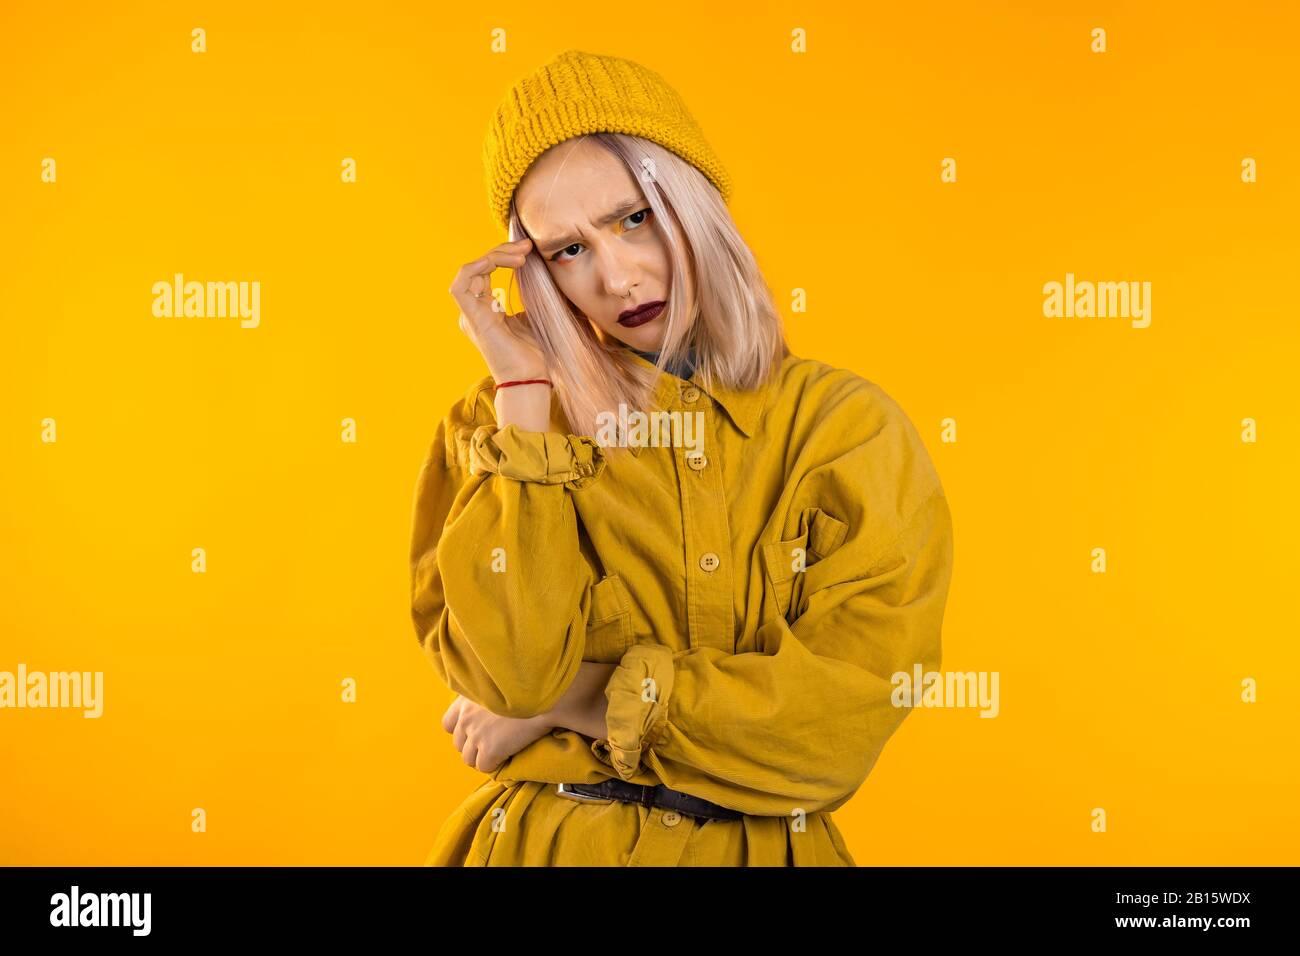 Young upset woman with white hair having headache, studio portrait. Stock Photo